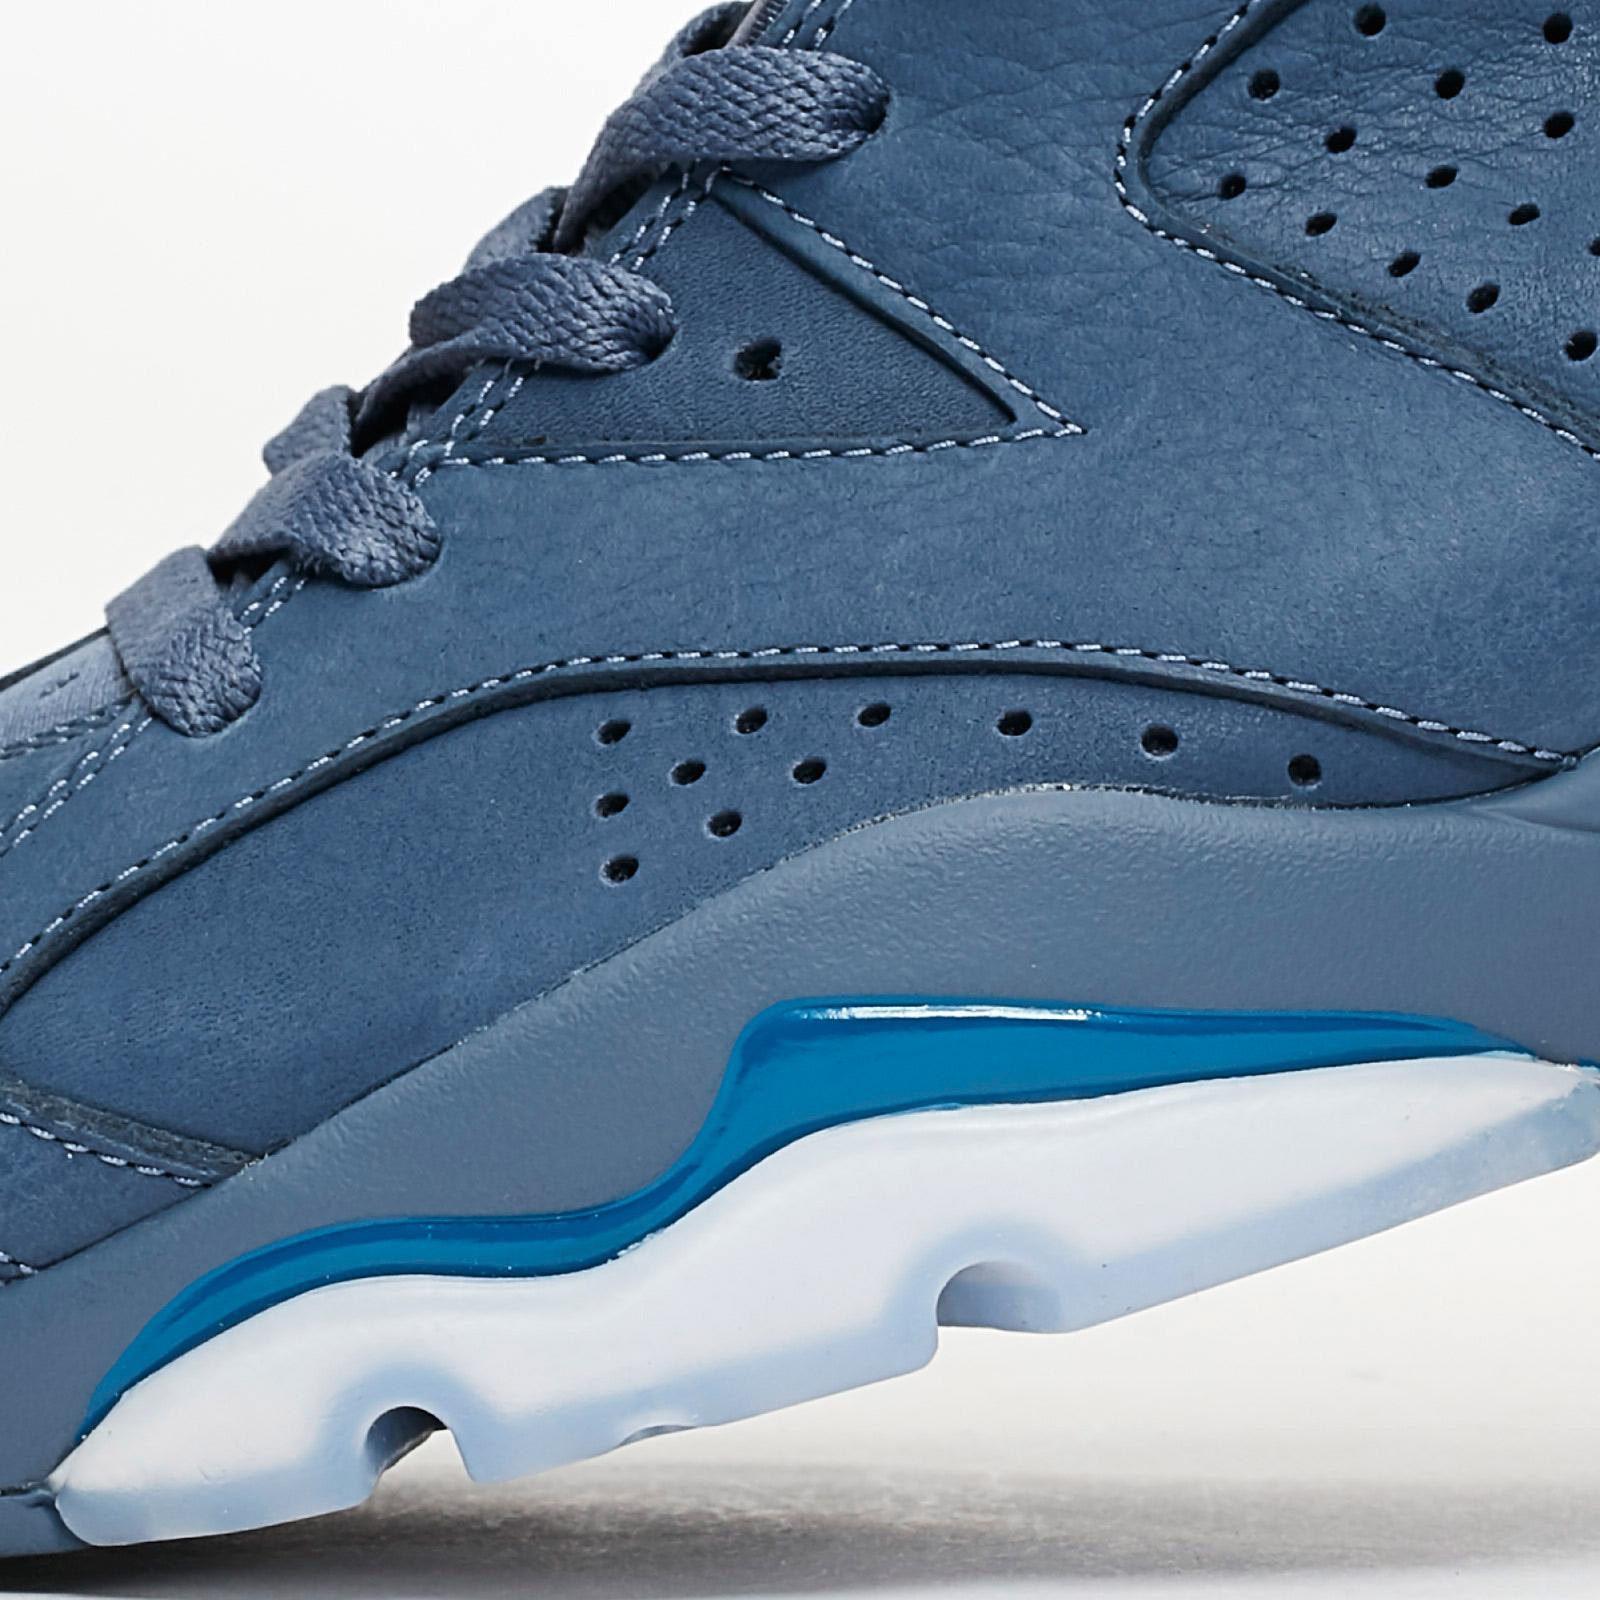 54af39dd60d6a7 Jordan Brand Air Jordan 6 Retro - 384664-400 - Sneakersnstuff ...